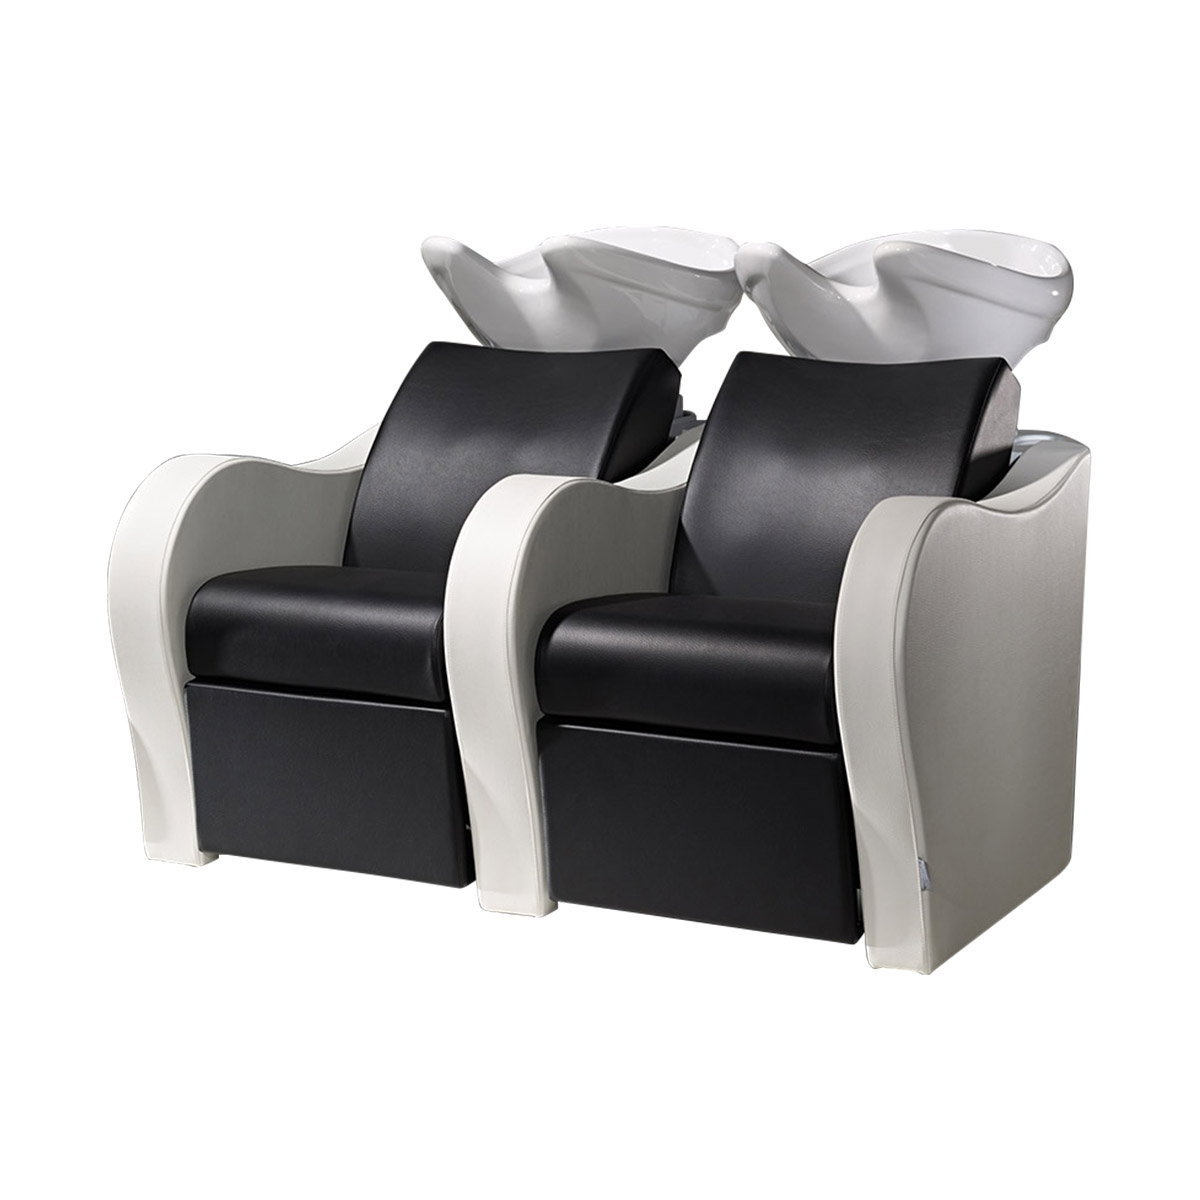 Popular Sofa Pedicure Chairs Regarding Salon Ambience Wu128 Luxury Sofa Salon Sink And 2 Chair Combo (View 10 of 15)